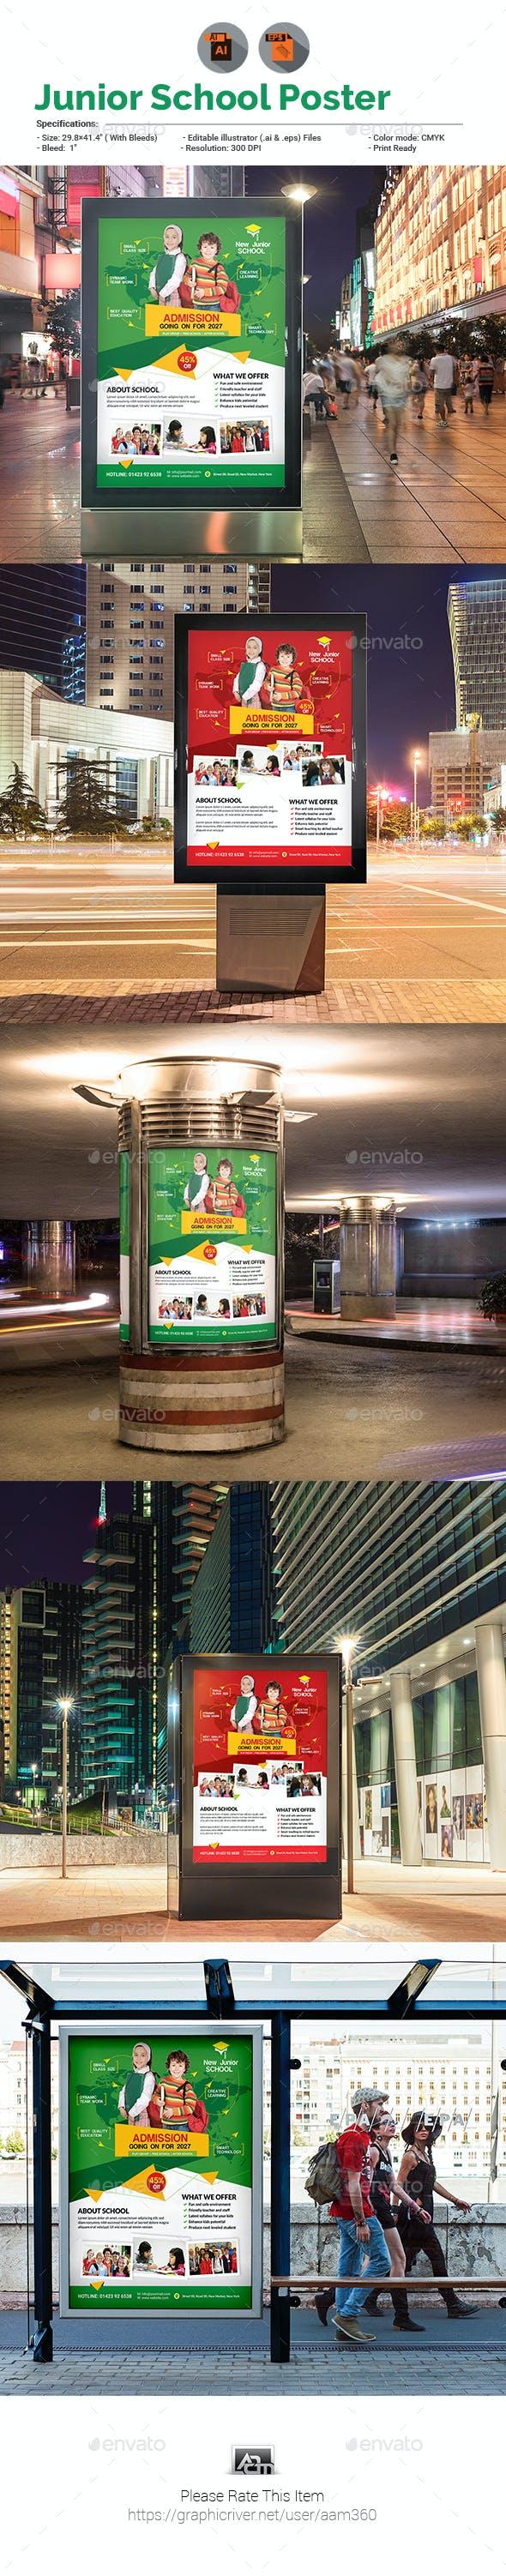 Junior School Promotion Poster Template